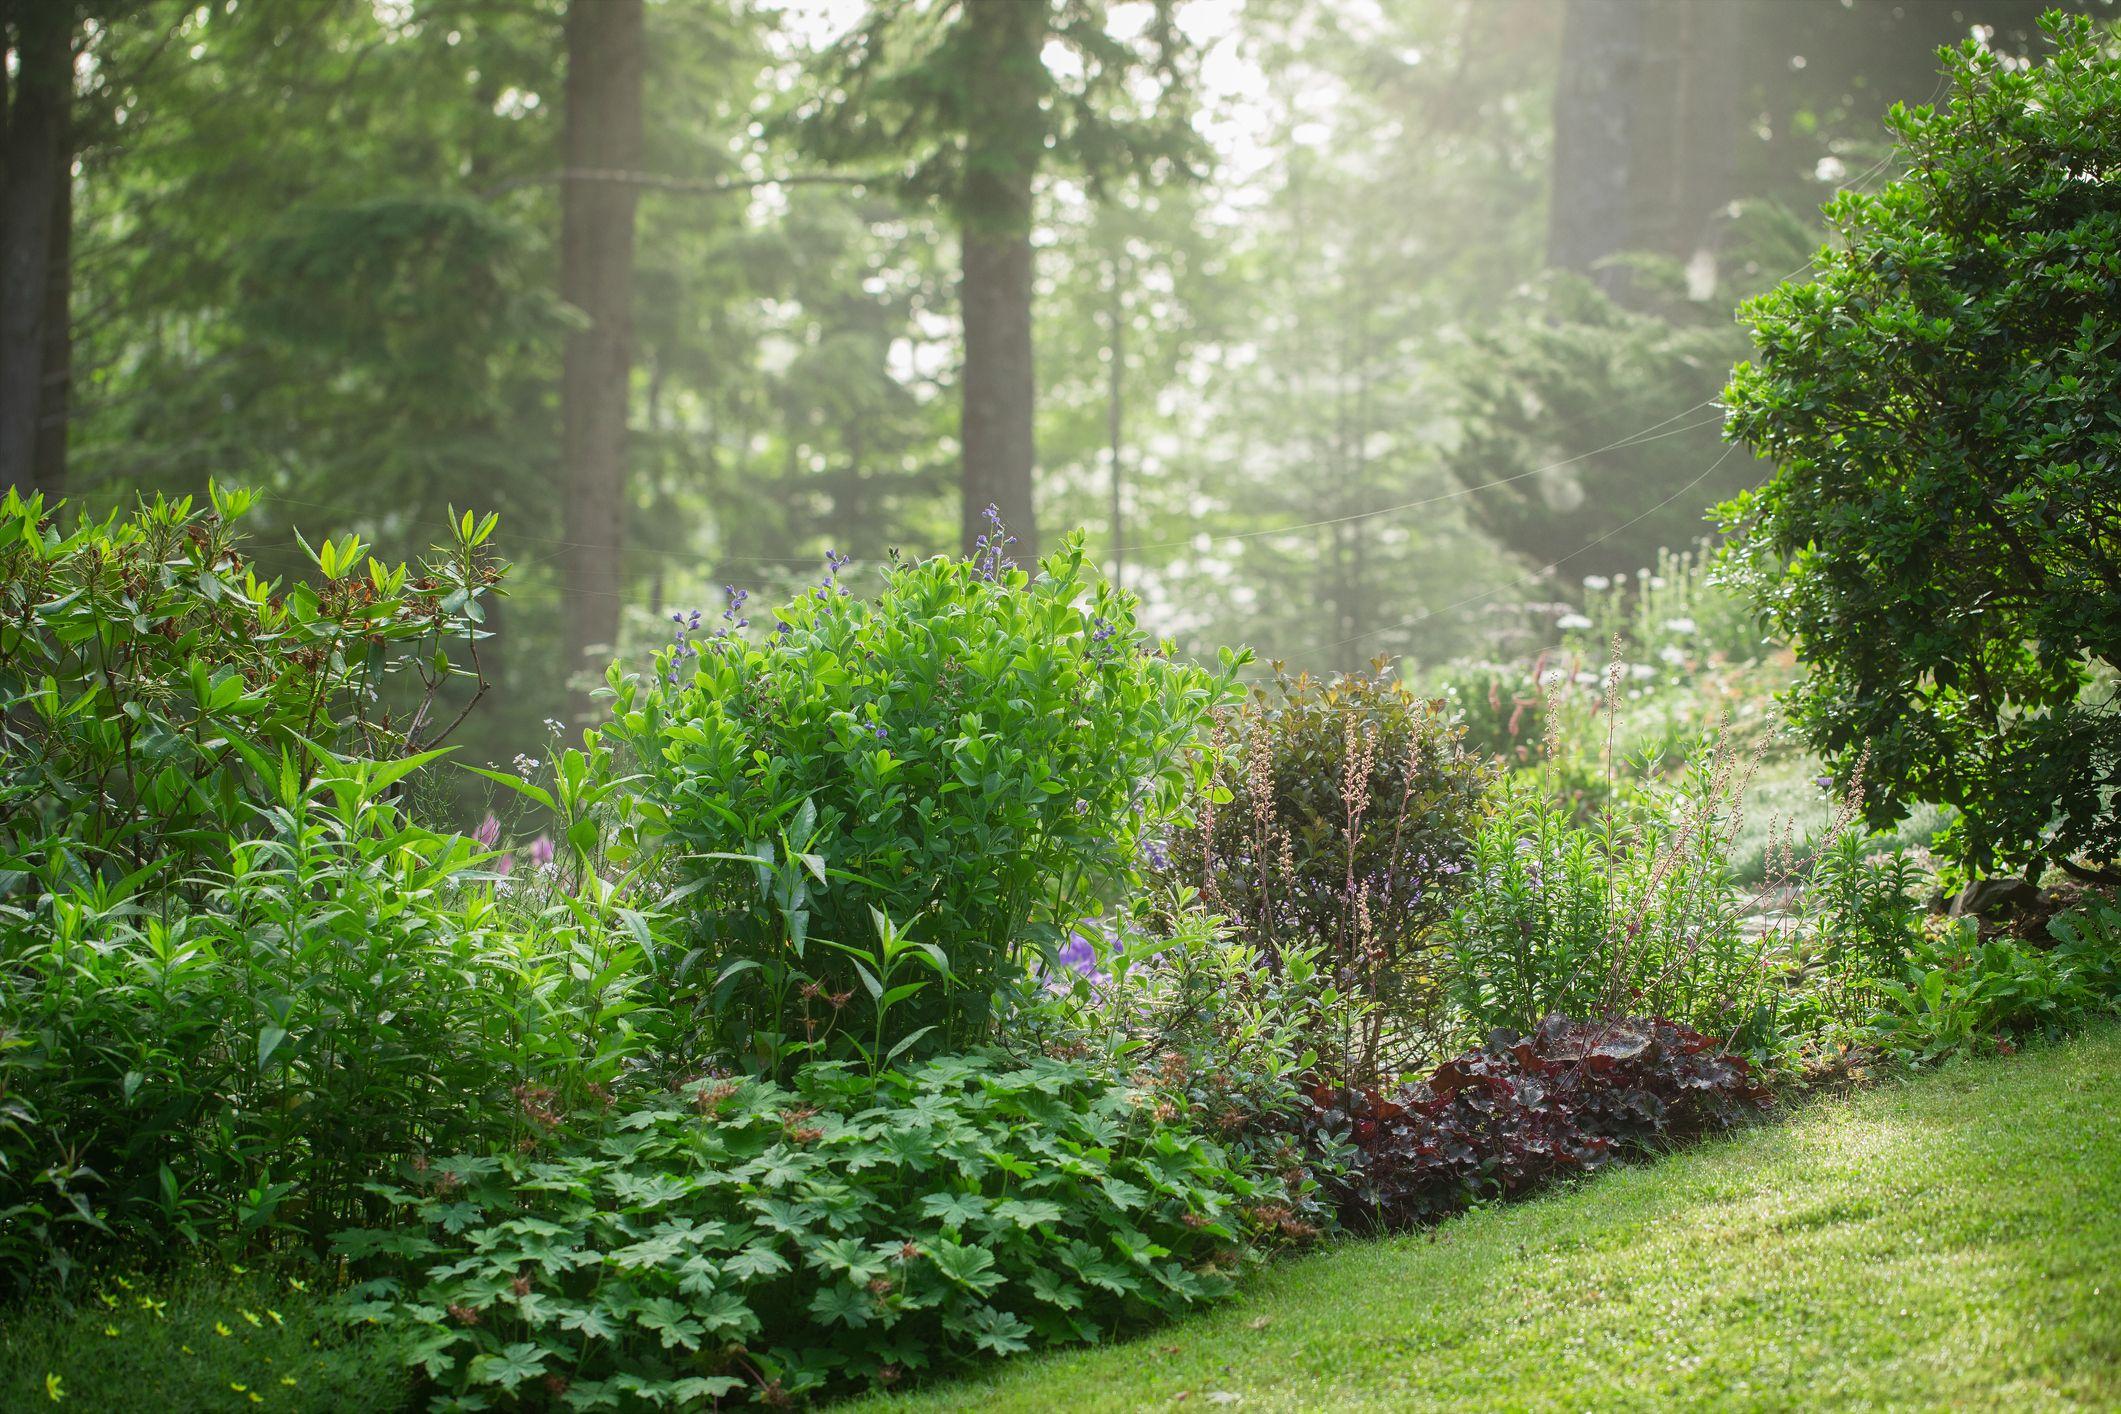 20 Perennials That Thrive in Shade